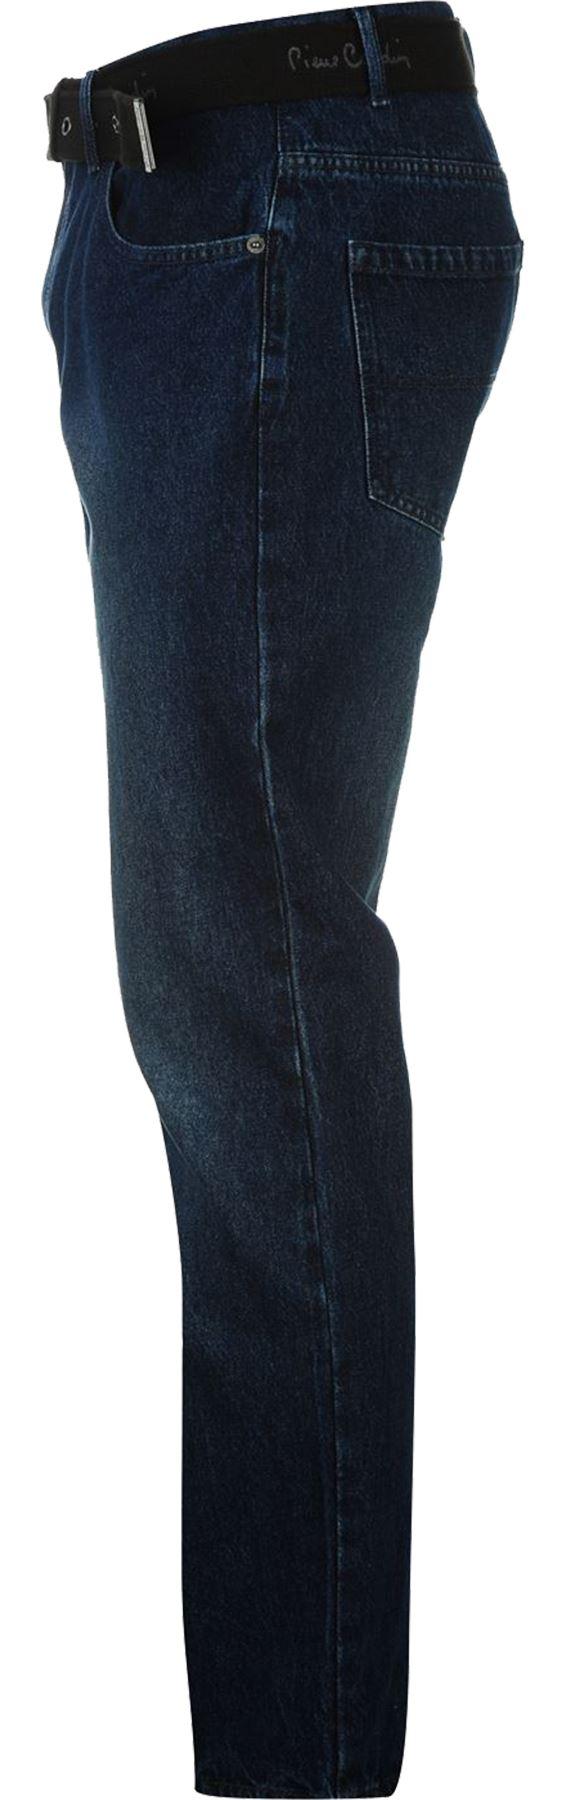 Mens-Belted-Denim-Jeans-Straight-Leg-Regular-Fit-Pierre-Cardin-Pants-Big-Tall thumbnail 15